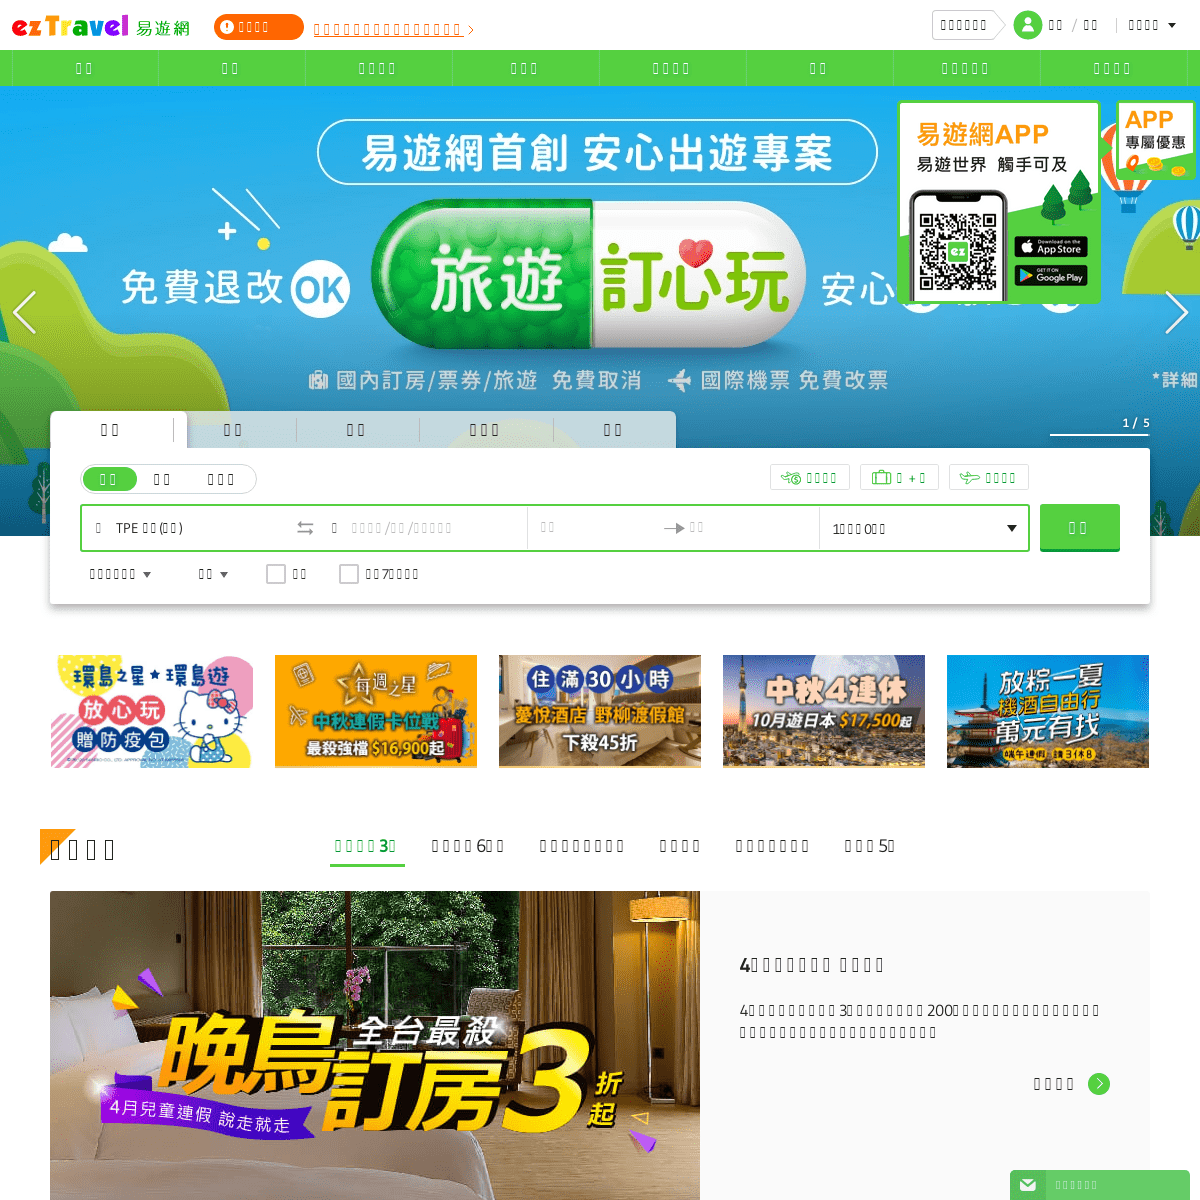 ezTravel易遊網 - 易遊世界.觸手可及 eztravel.com.tw (Citation ArchiveBay.com)